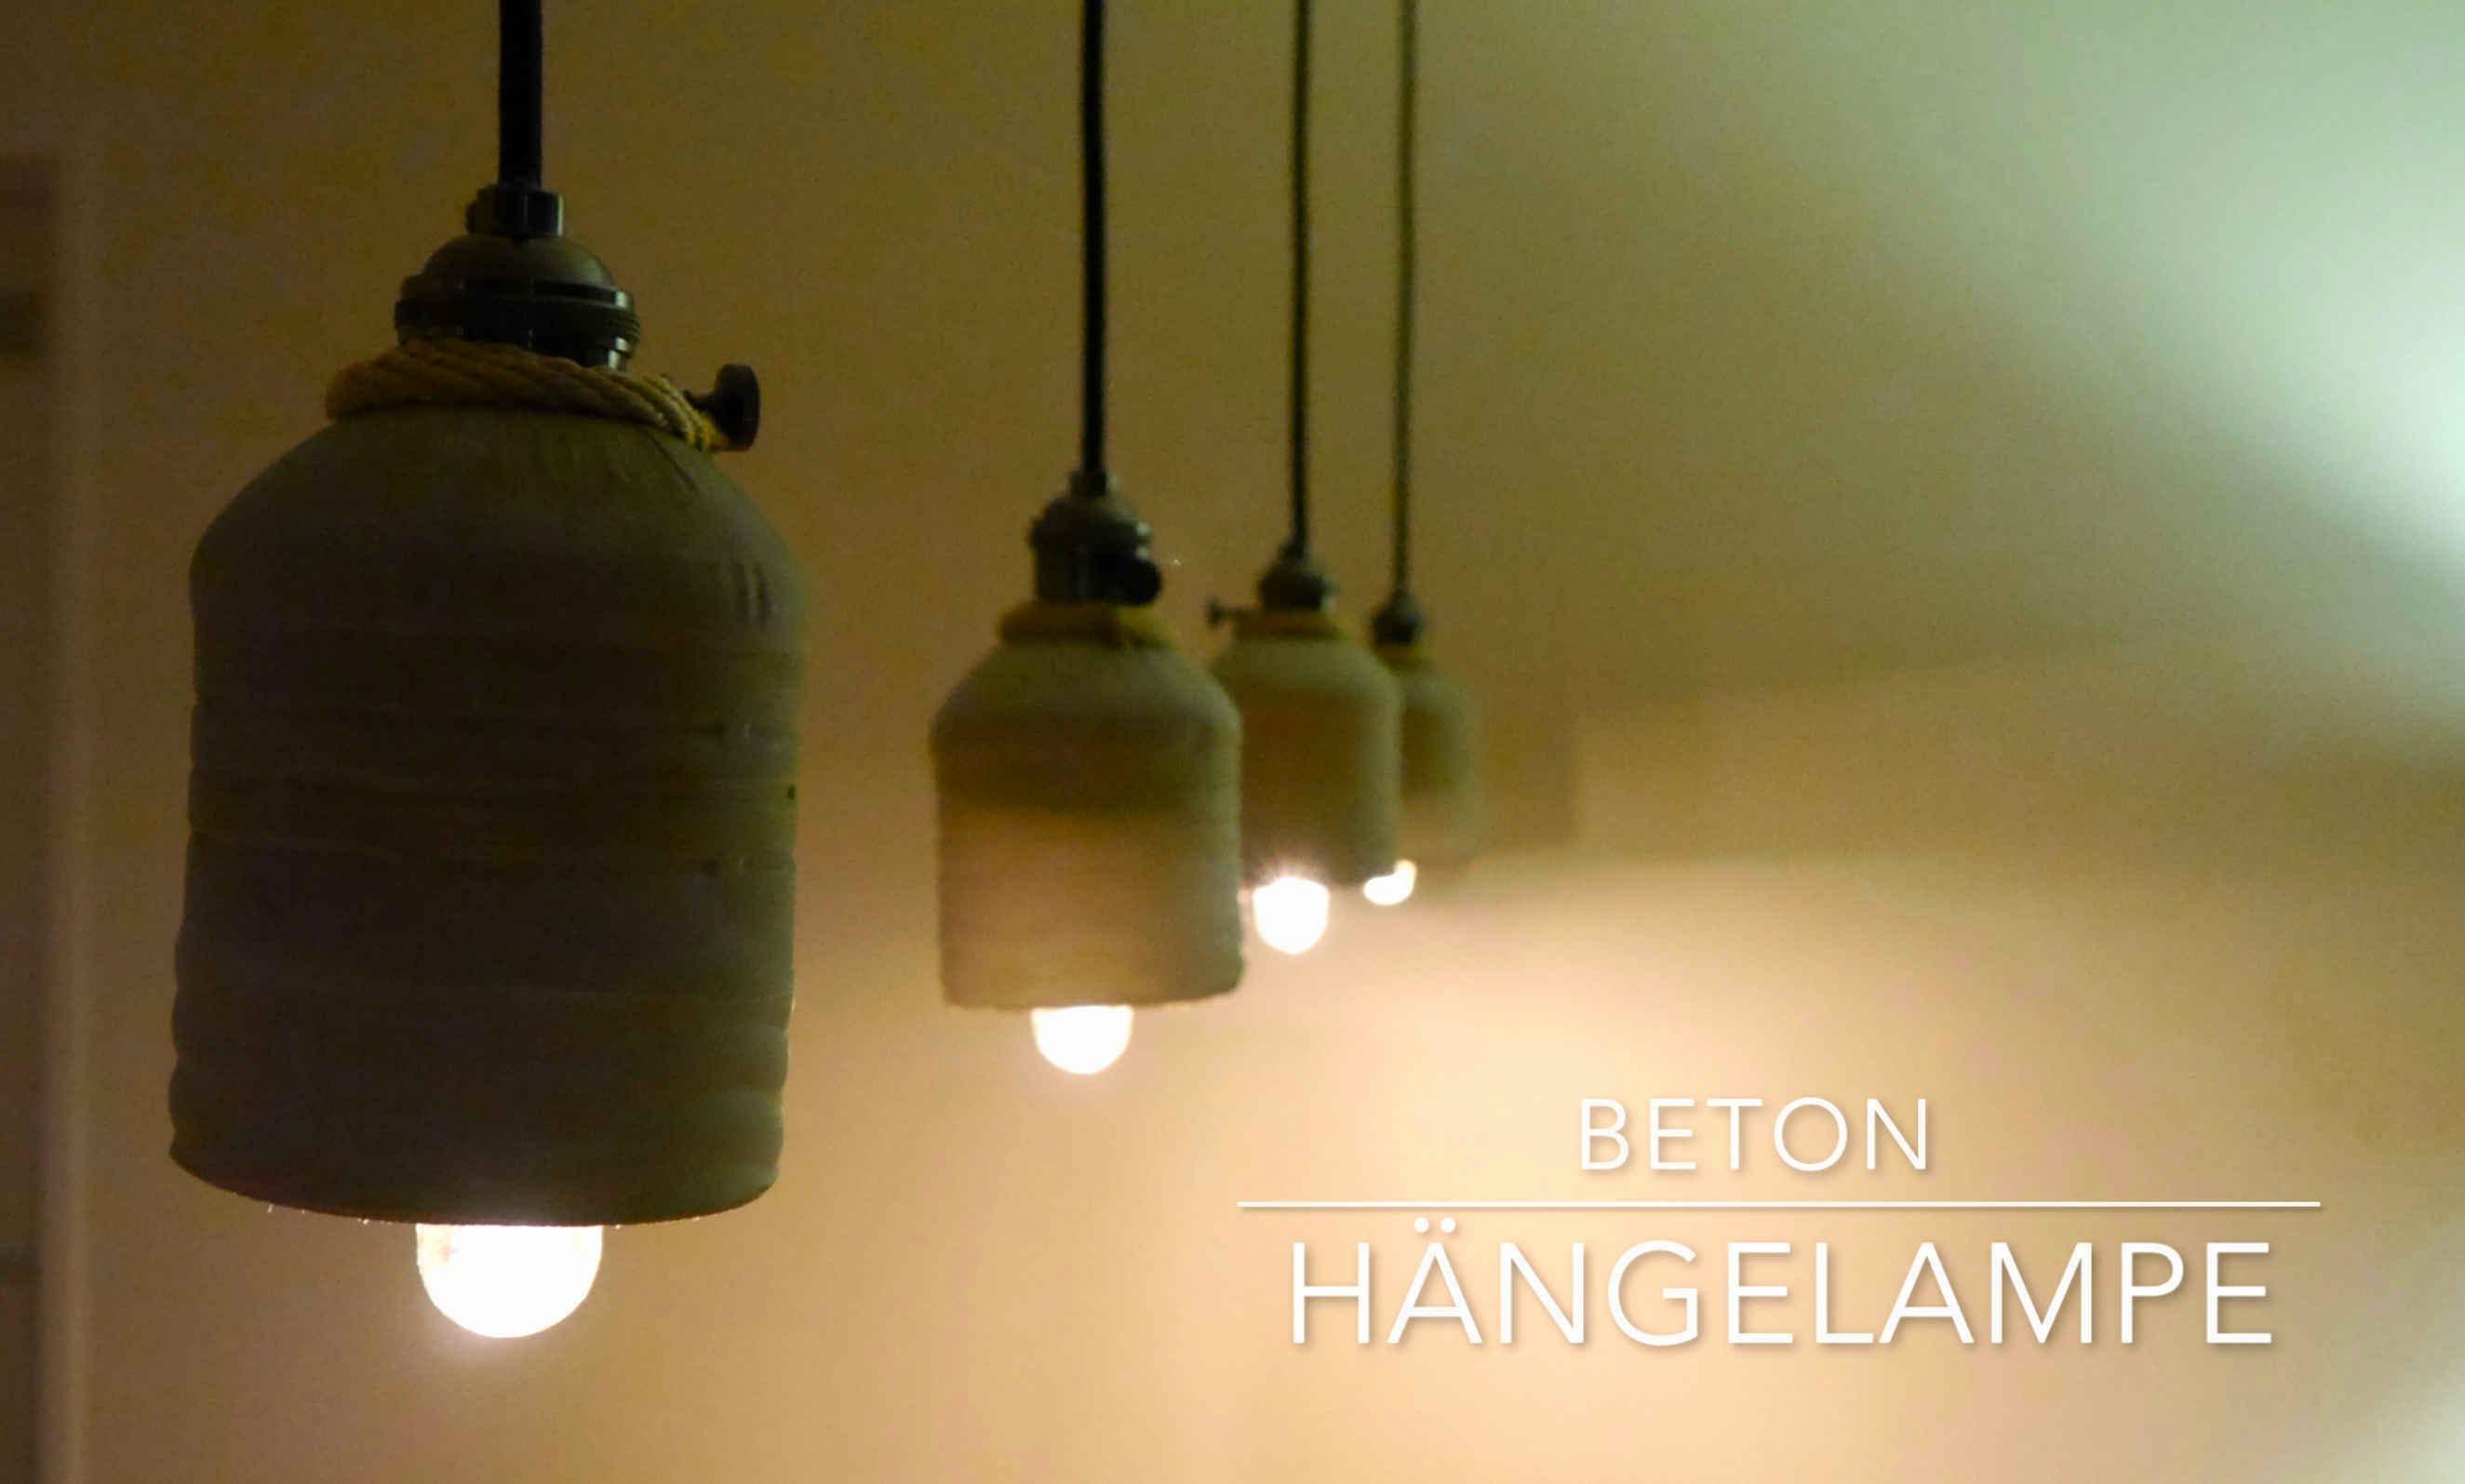 diy upcycling beton h nge lampen anleitung bonus material. Black Bedroom Furniture Sets. Home Design Ideas